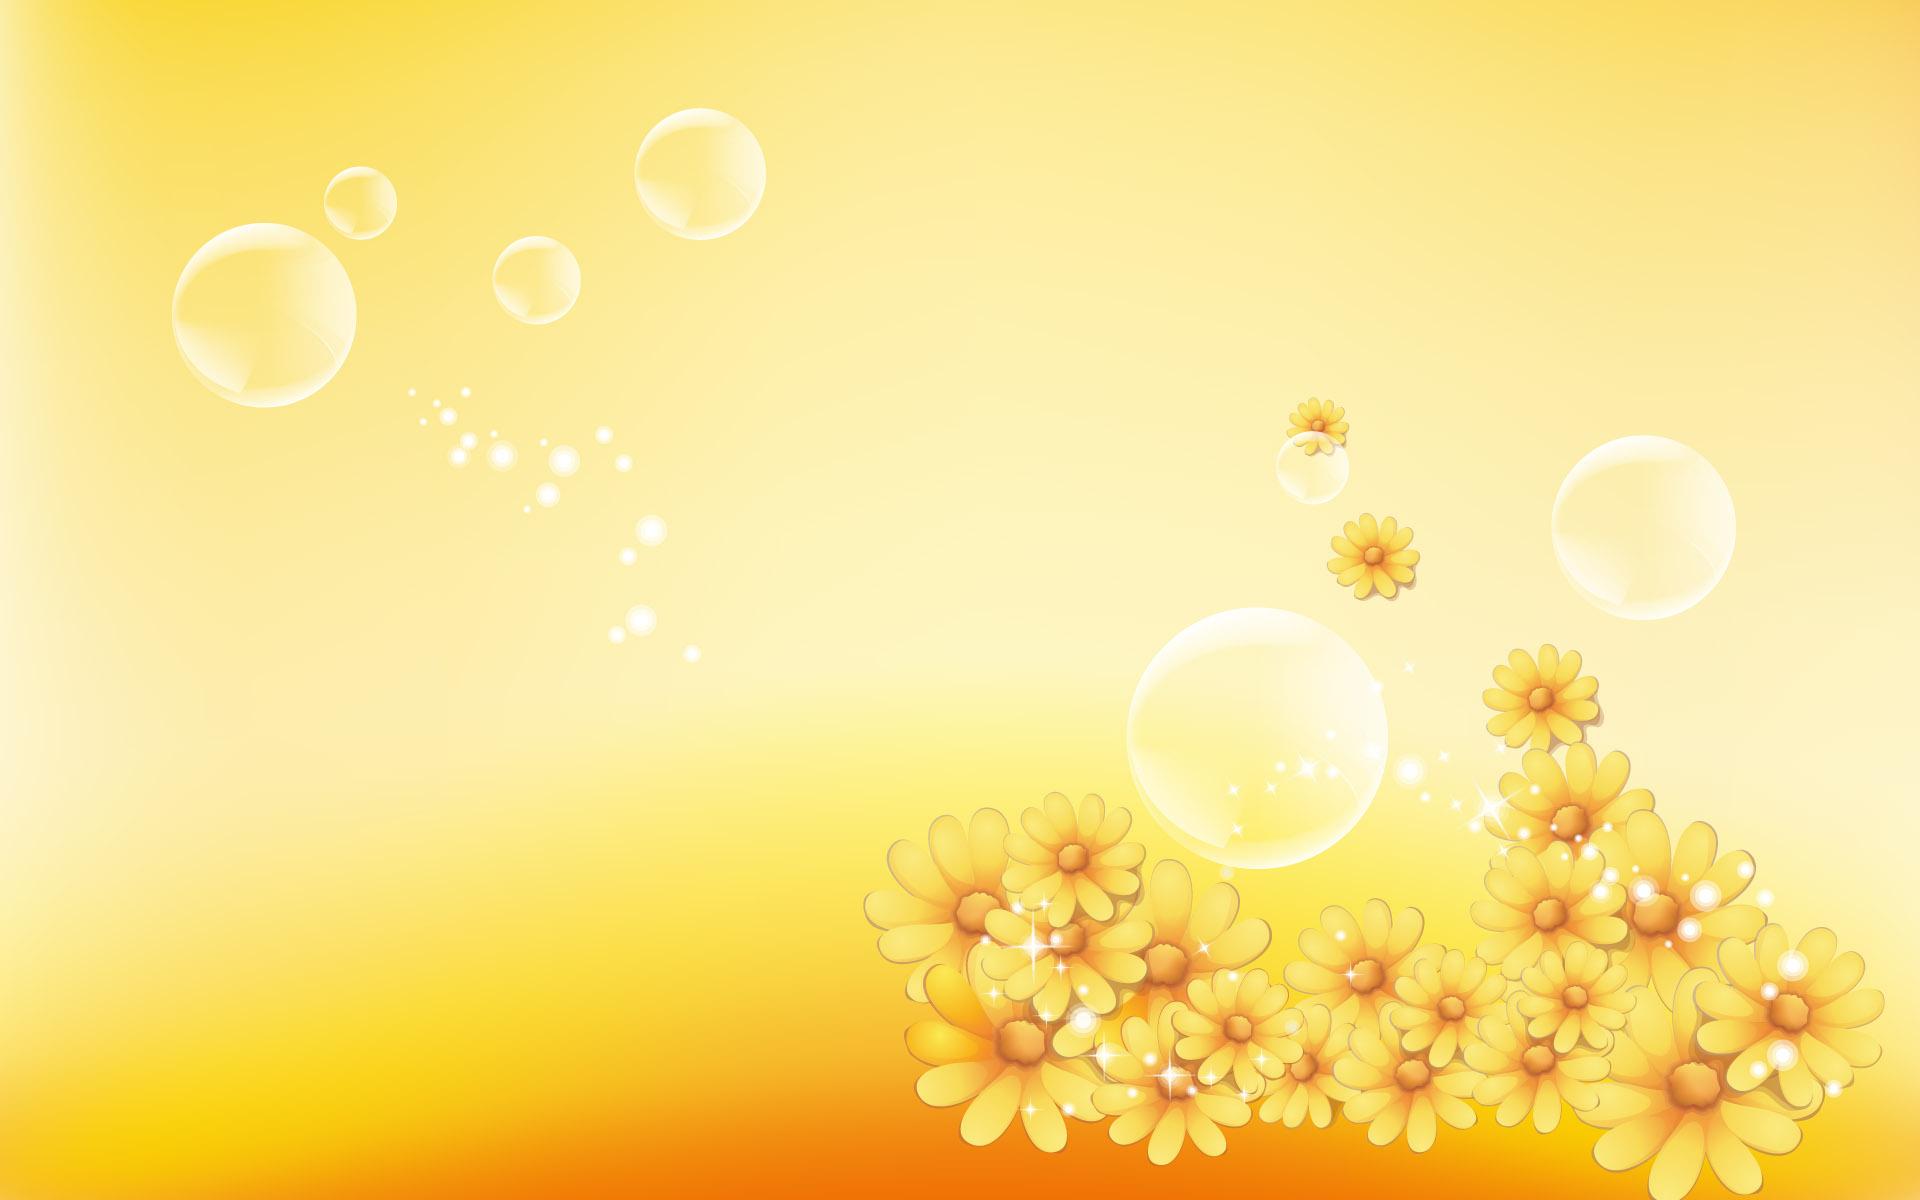 yellow flowers background hd wallpaper yellow flowers background hd wallpaper